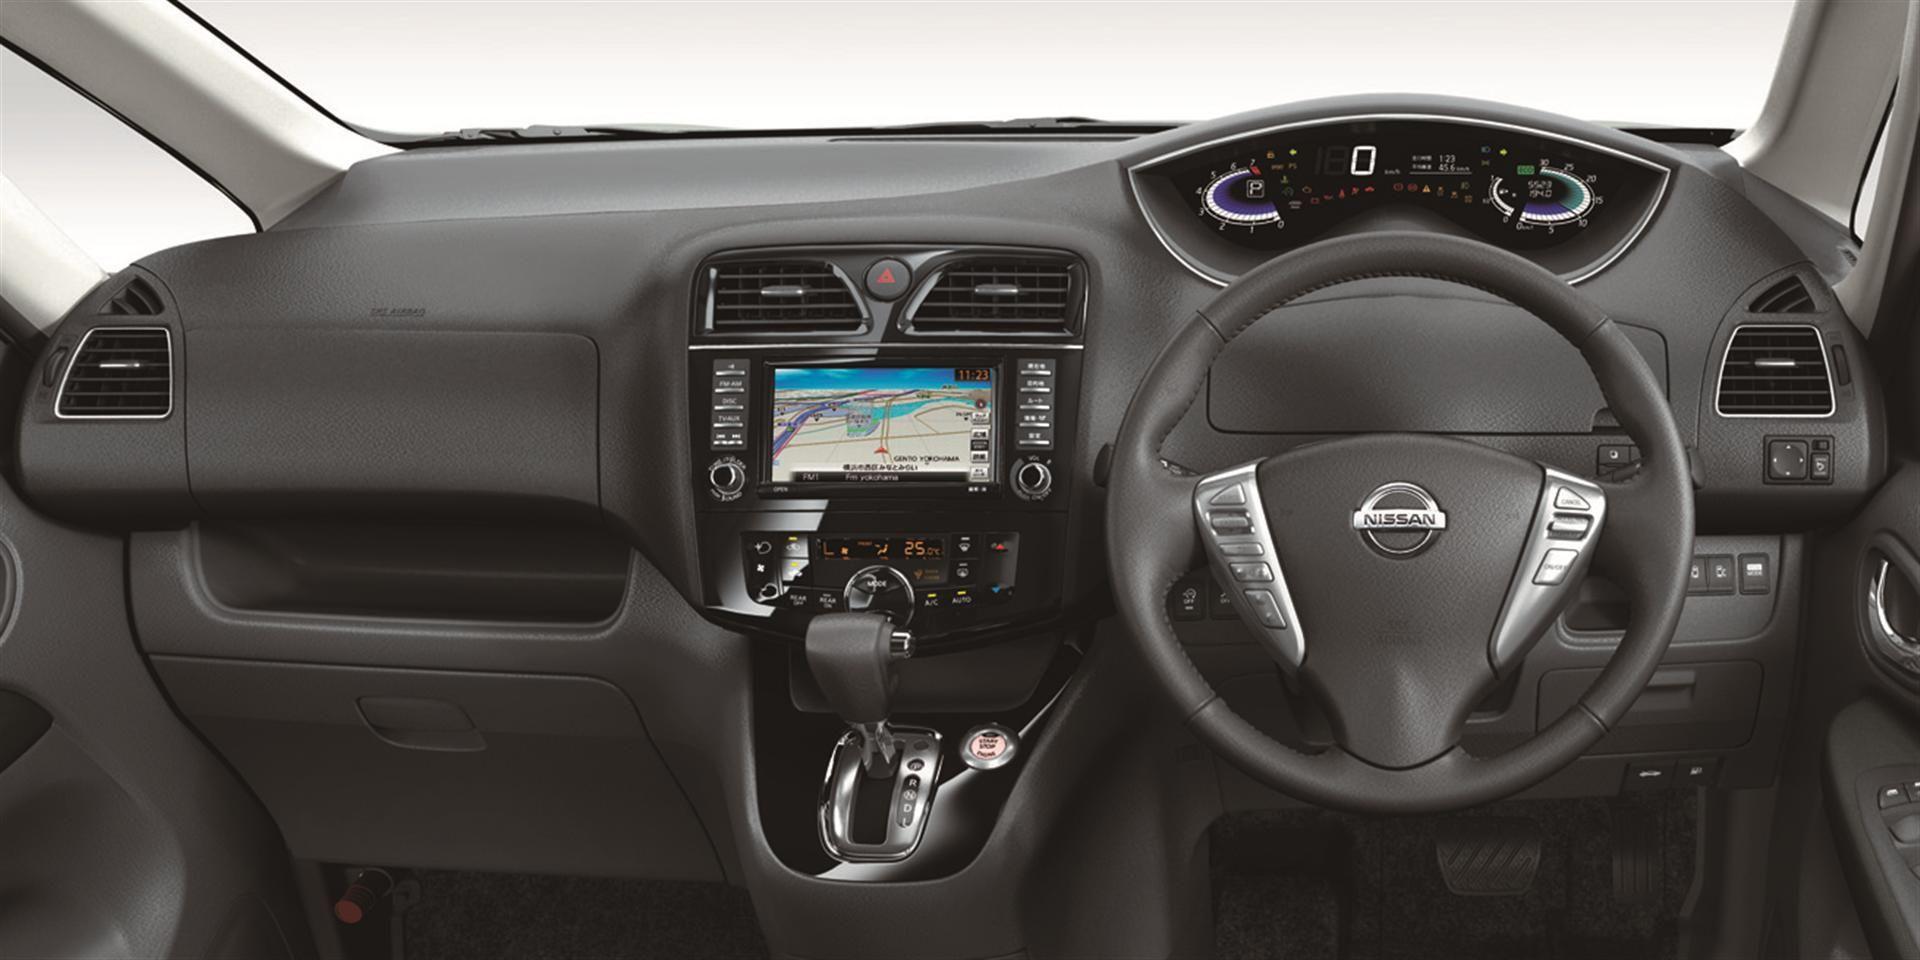 Nissan Serena Hybrid Interior Hybrid Car Nissan Car Interior